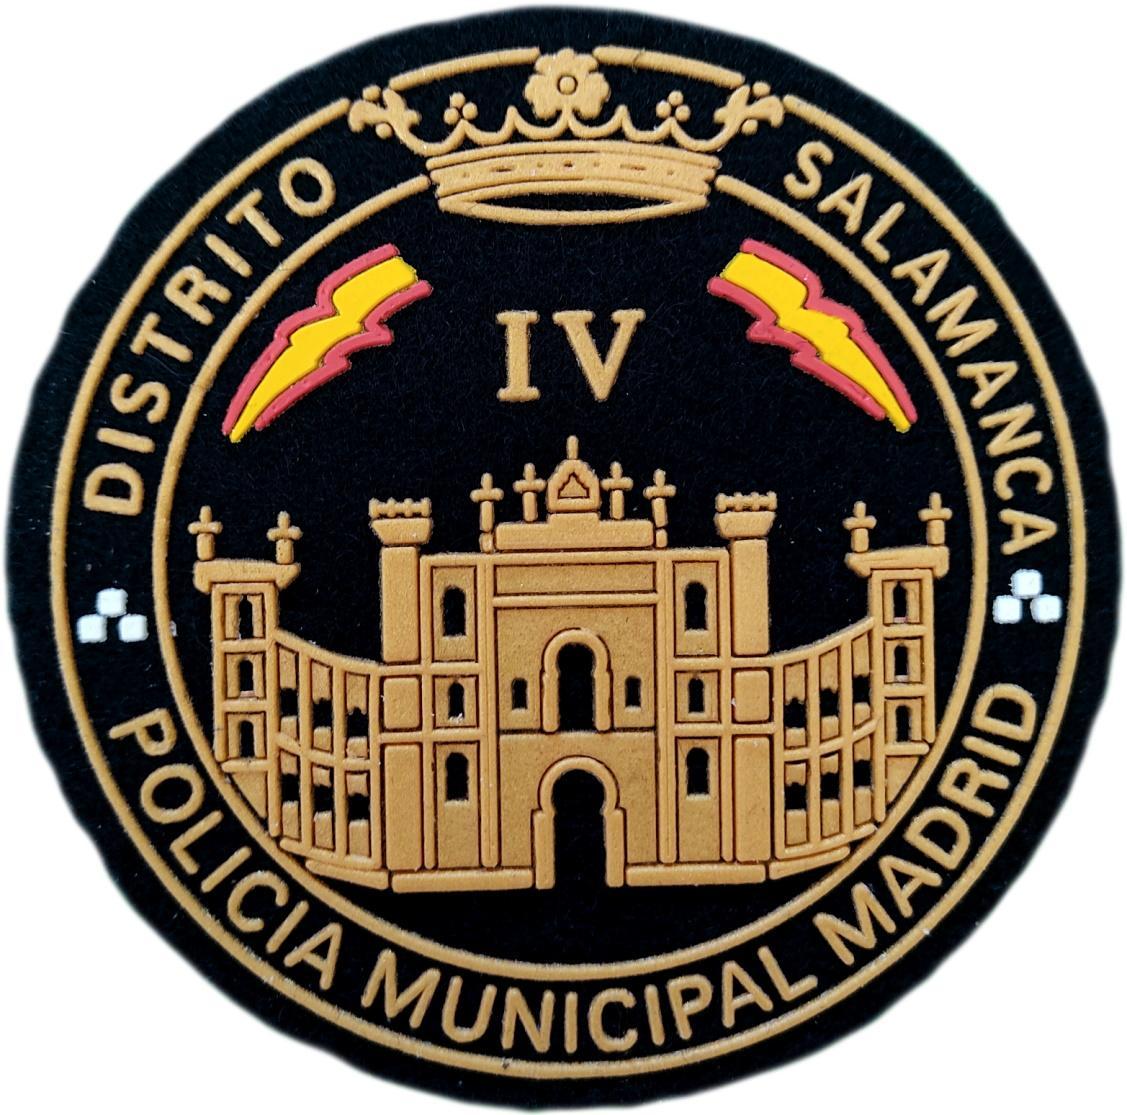 Policía Municipal Madrid Distrito Salamanca parche insignia emblema distintivo